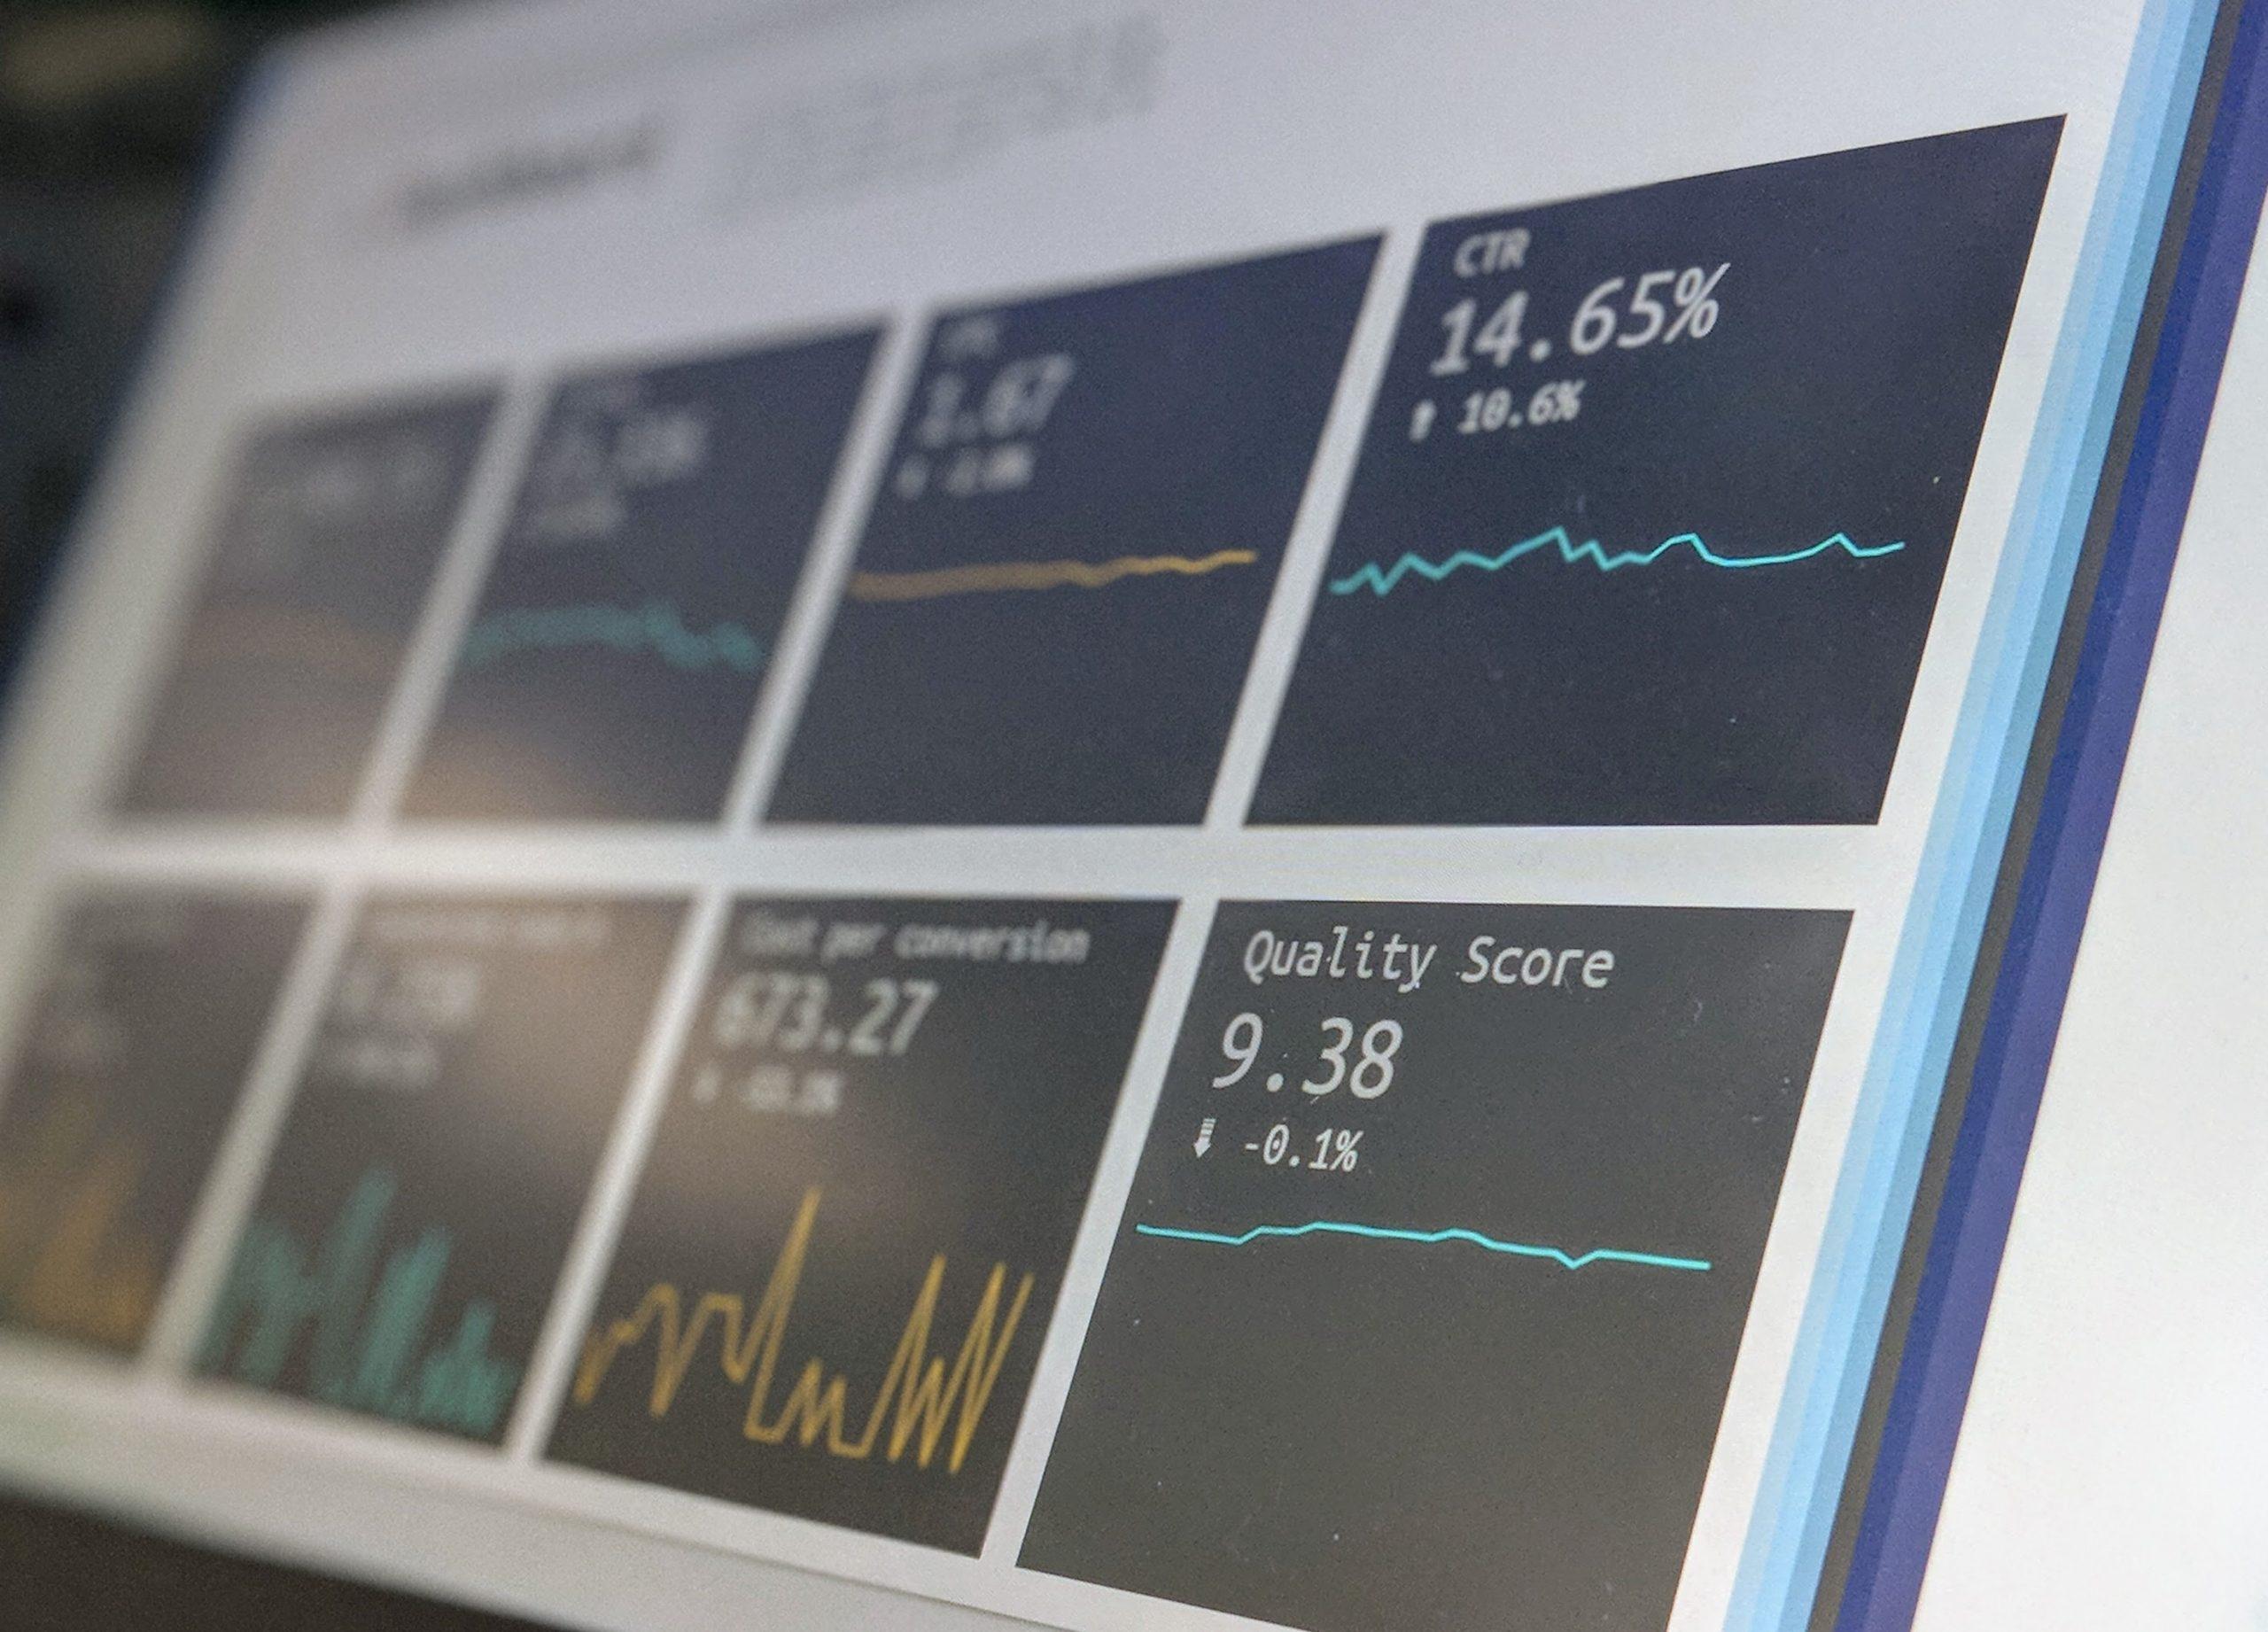 Website performance data displayed on computer